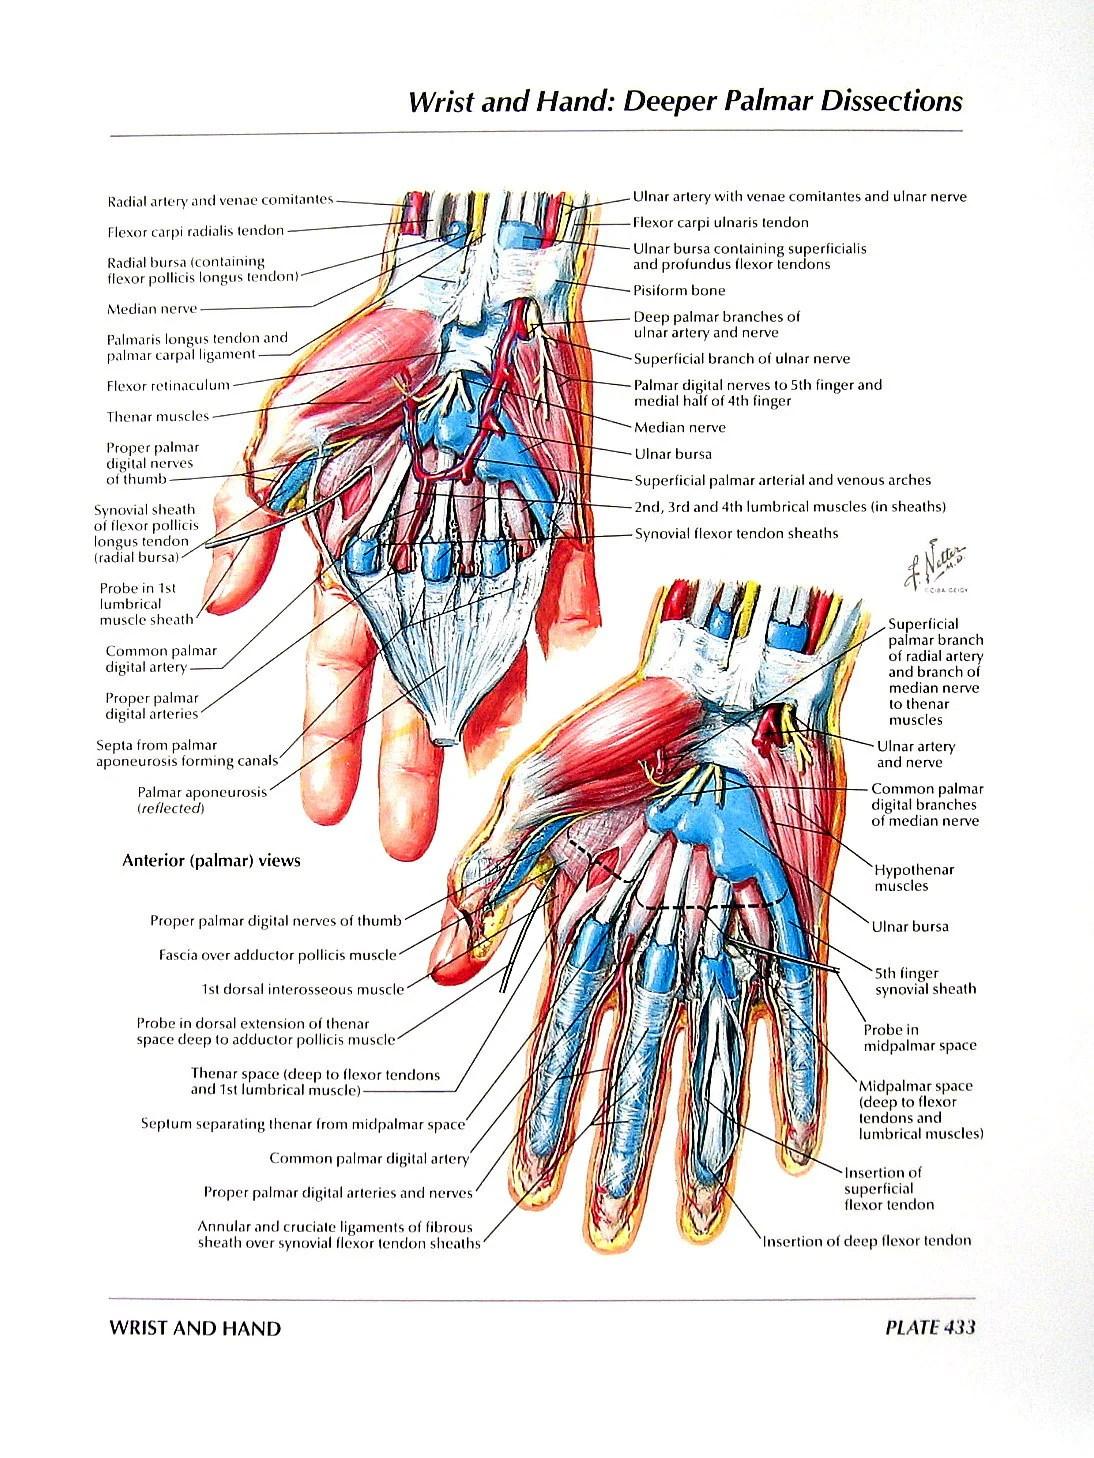 palmar hand muscle anatomy diagram 2002 hyundai accent wiring print wrist dissections flexor etsy 50